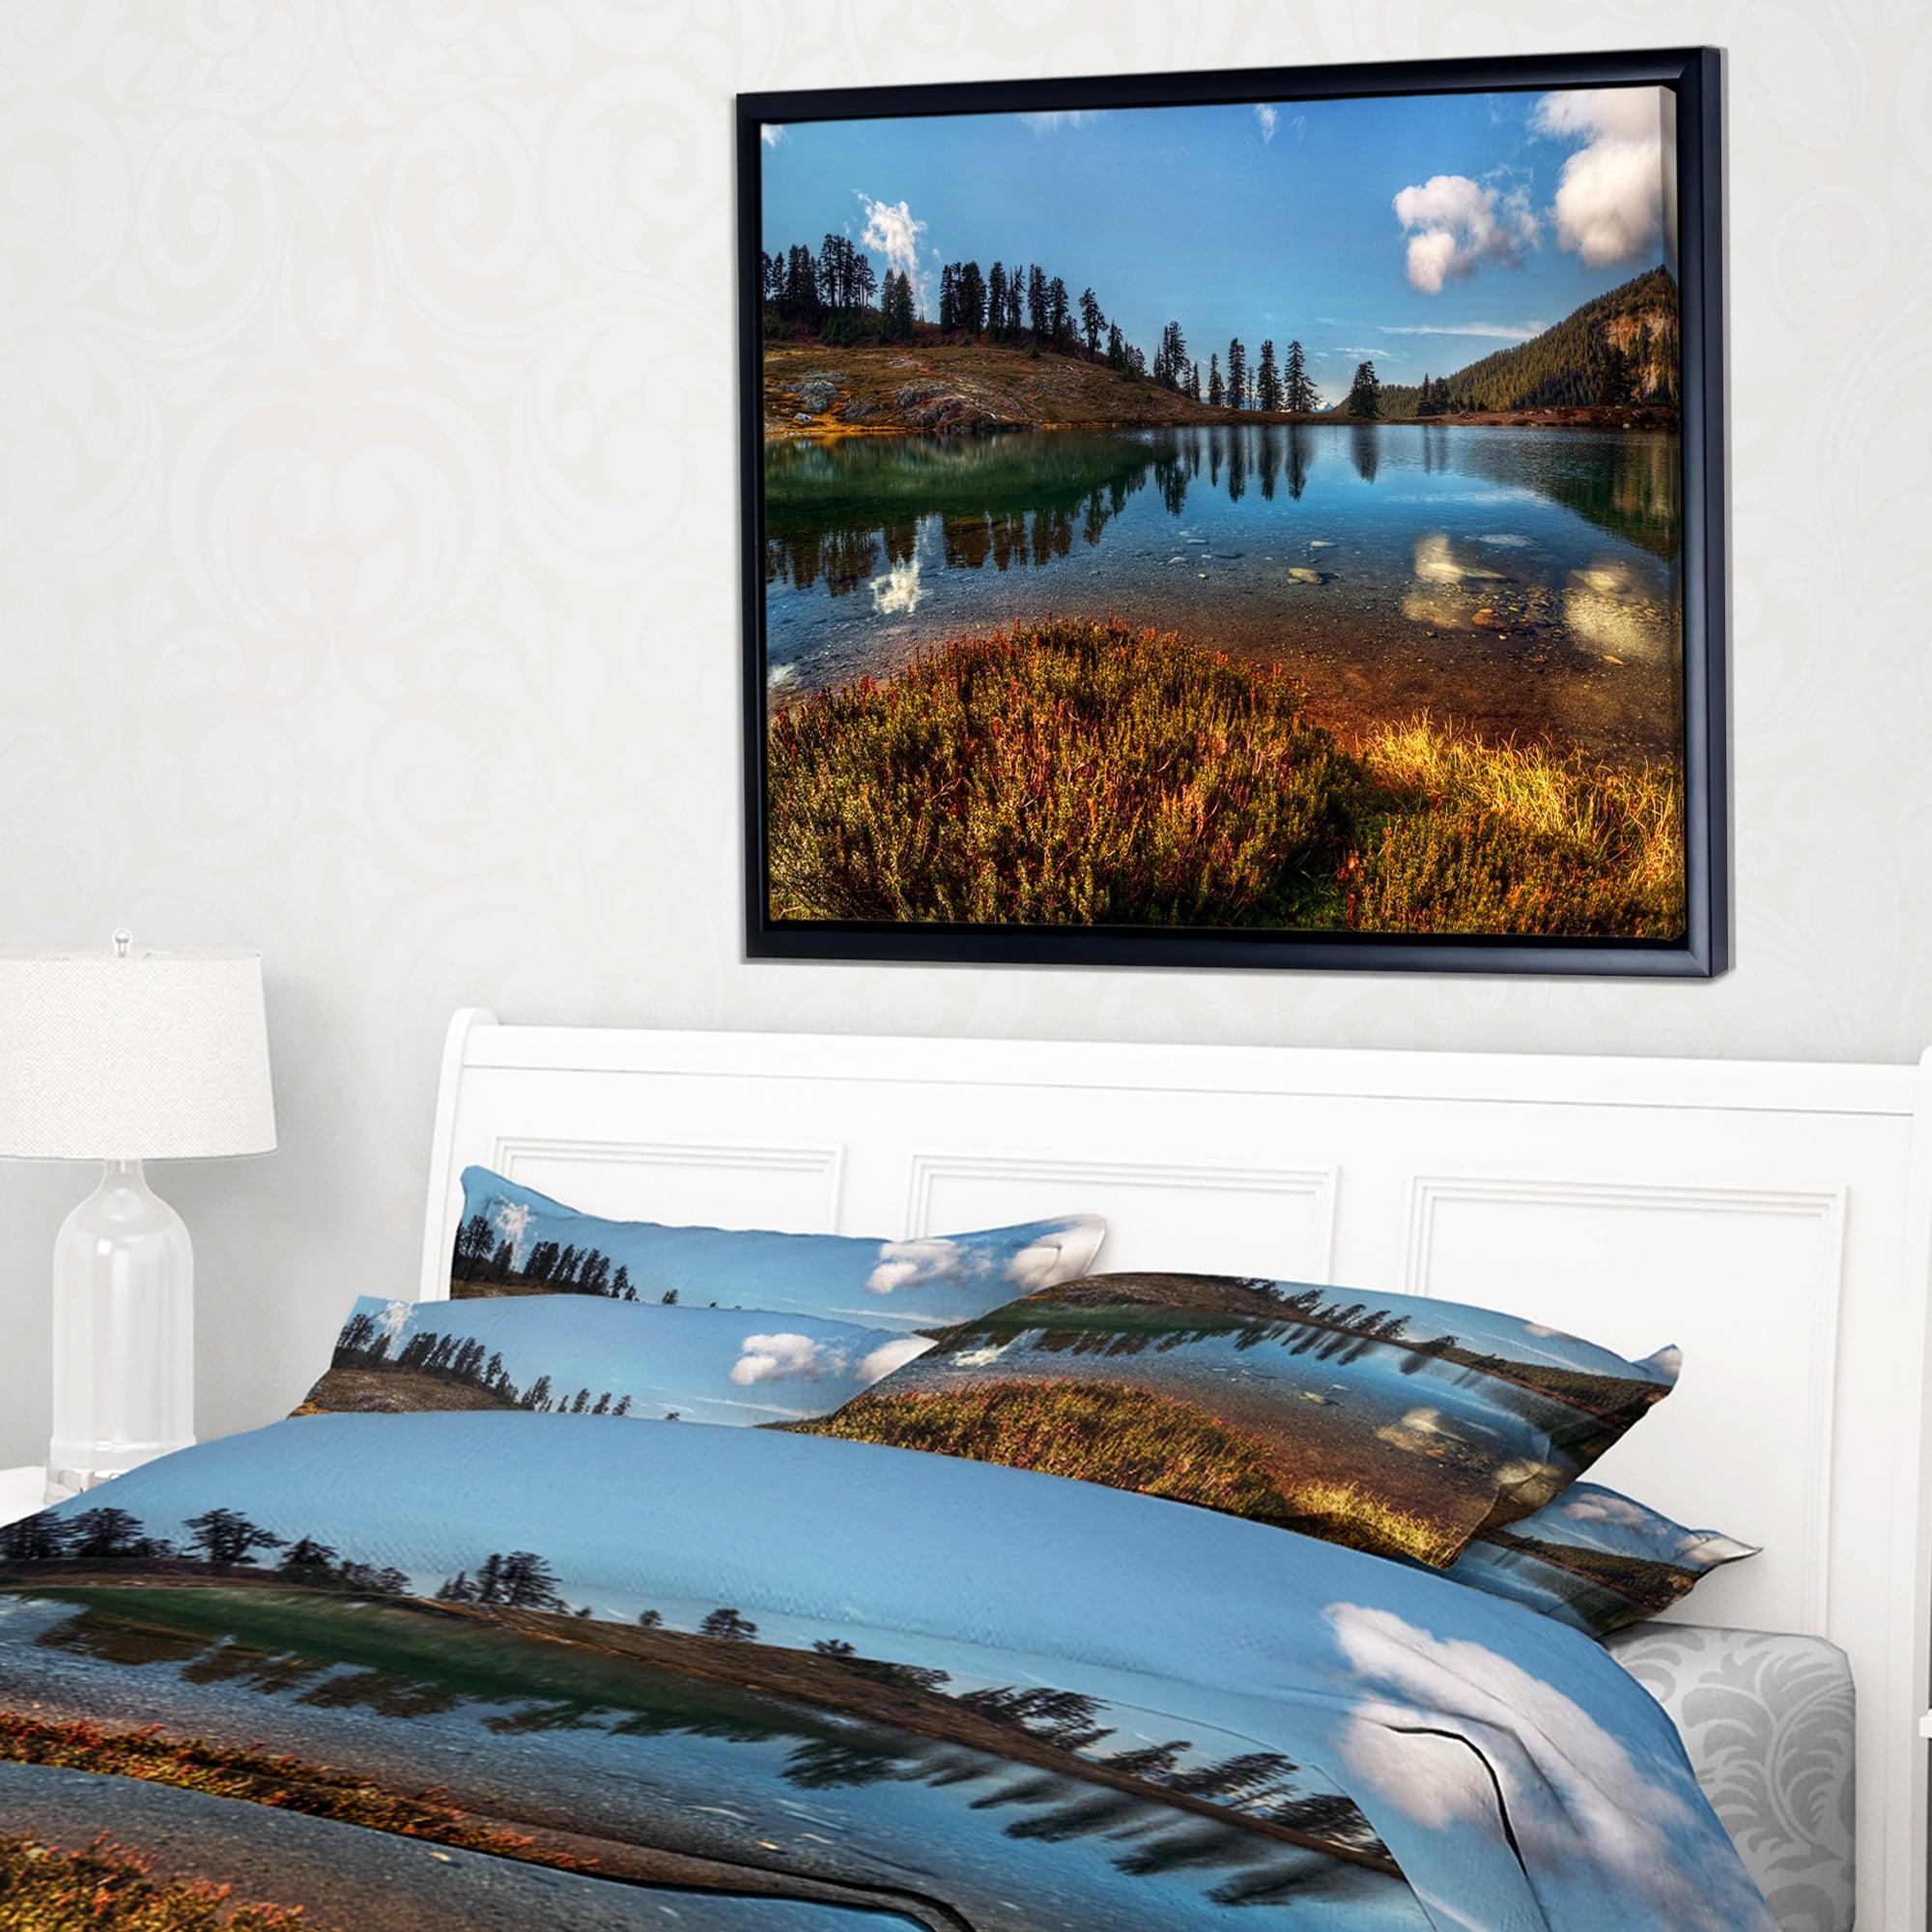 Designart Calm Mountain Lake And Clear Sky Landscape Framed Canvas Art Print Overstock 18959379